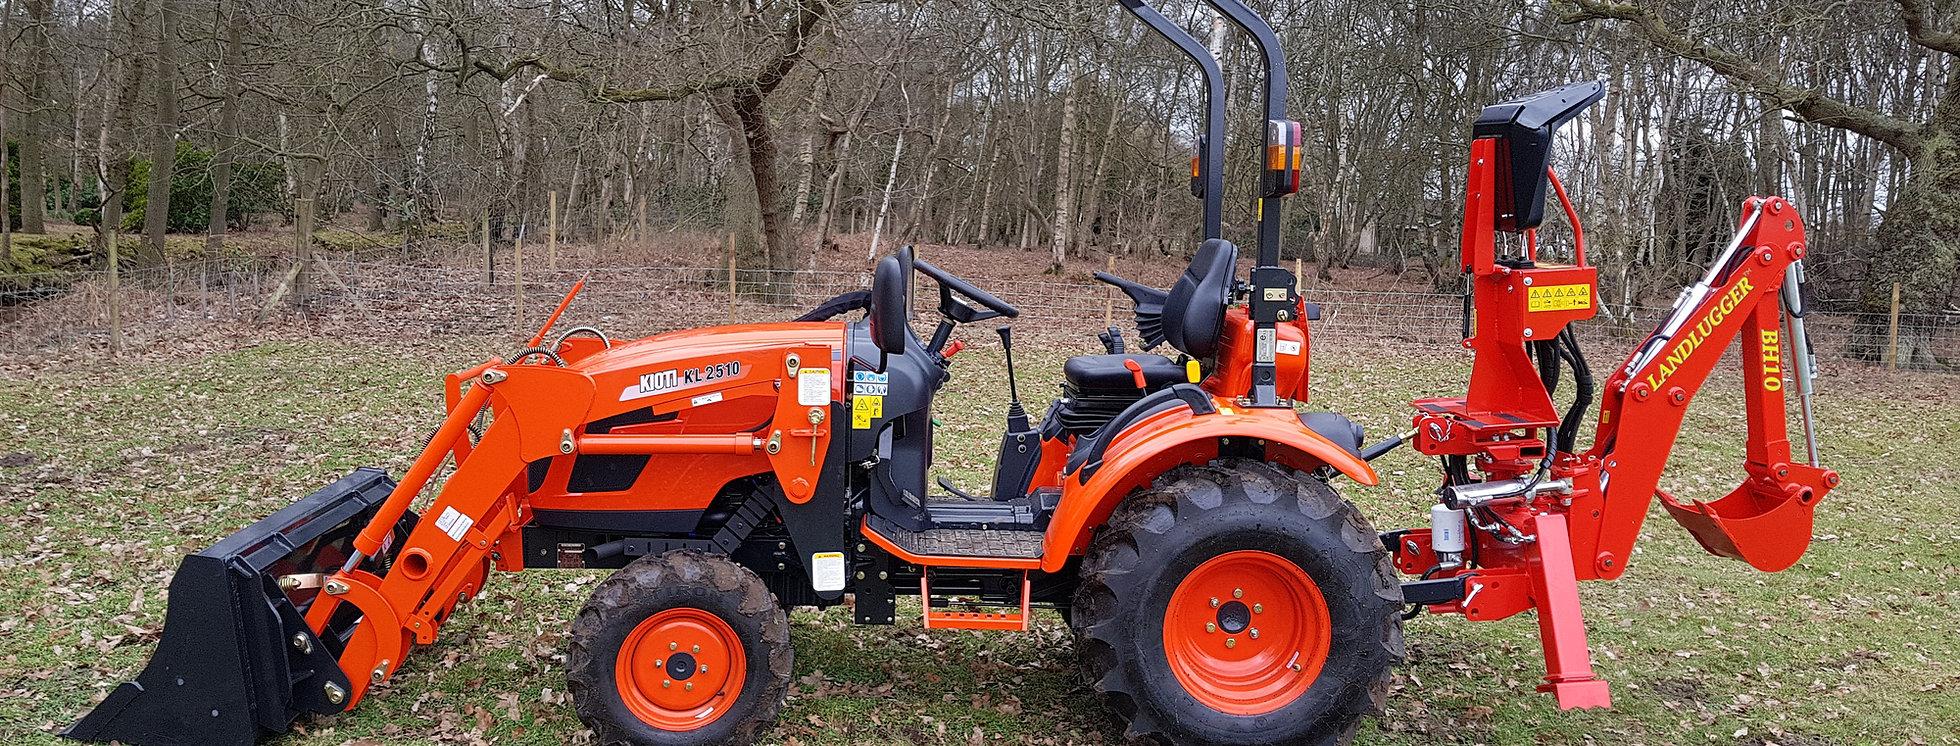 CK2810 HST Kioti Tractor Loader Digger   Compact Tractors For Sale UK